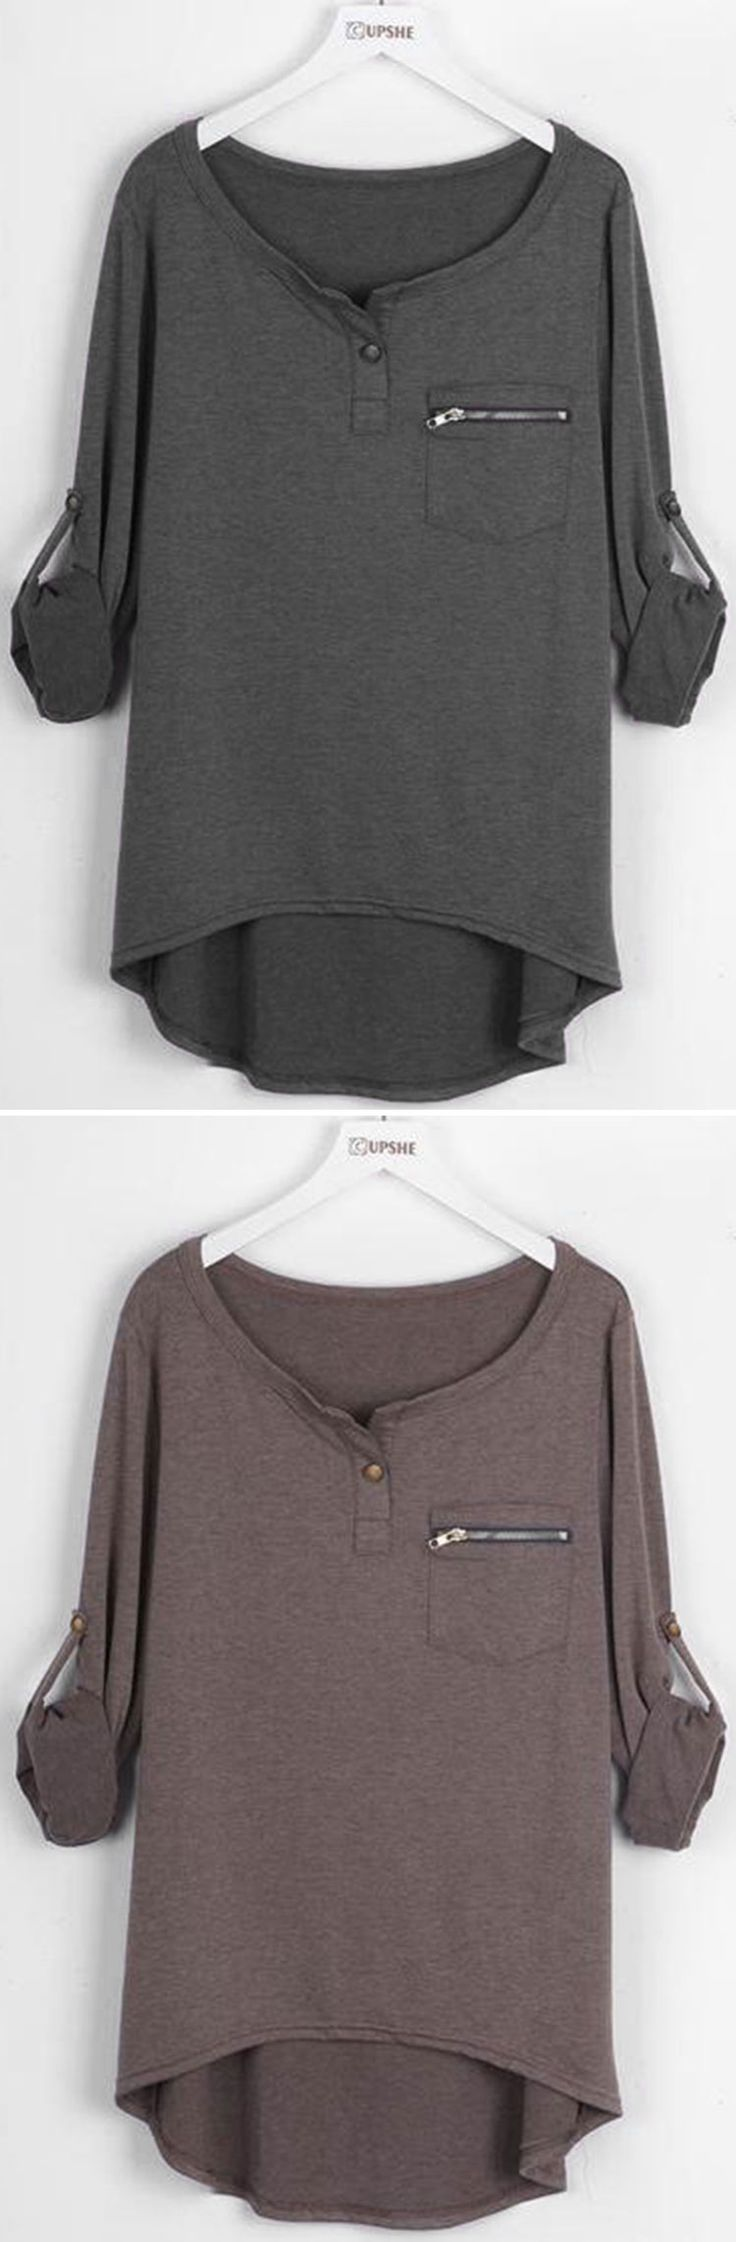 Shirt design new look - Big City Night High Low Top